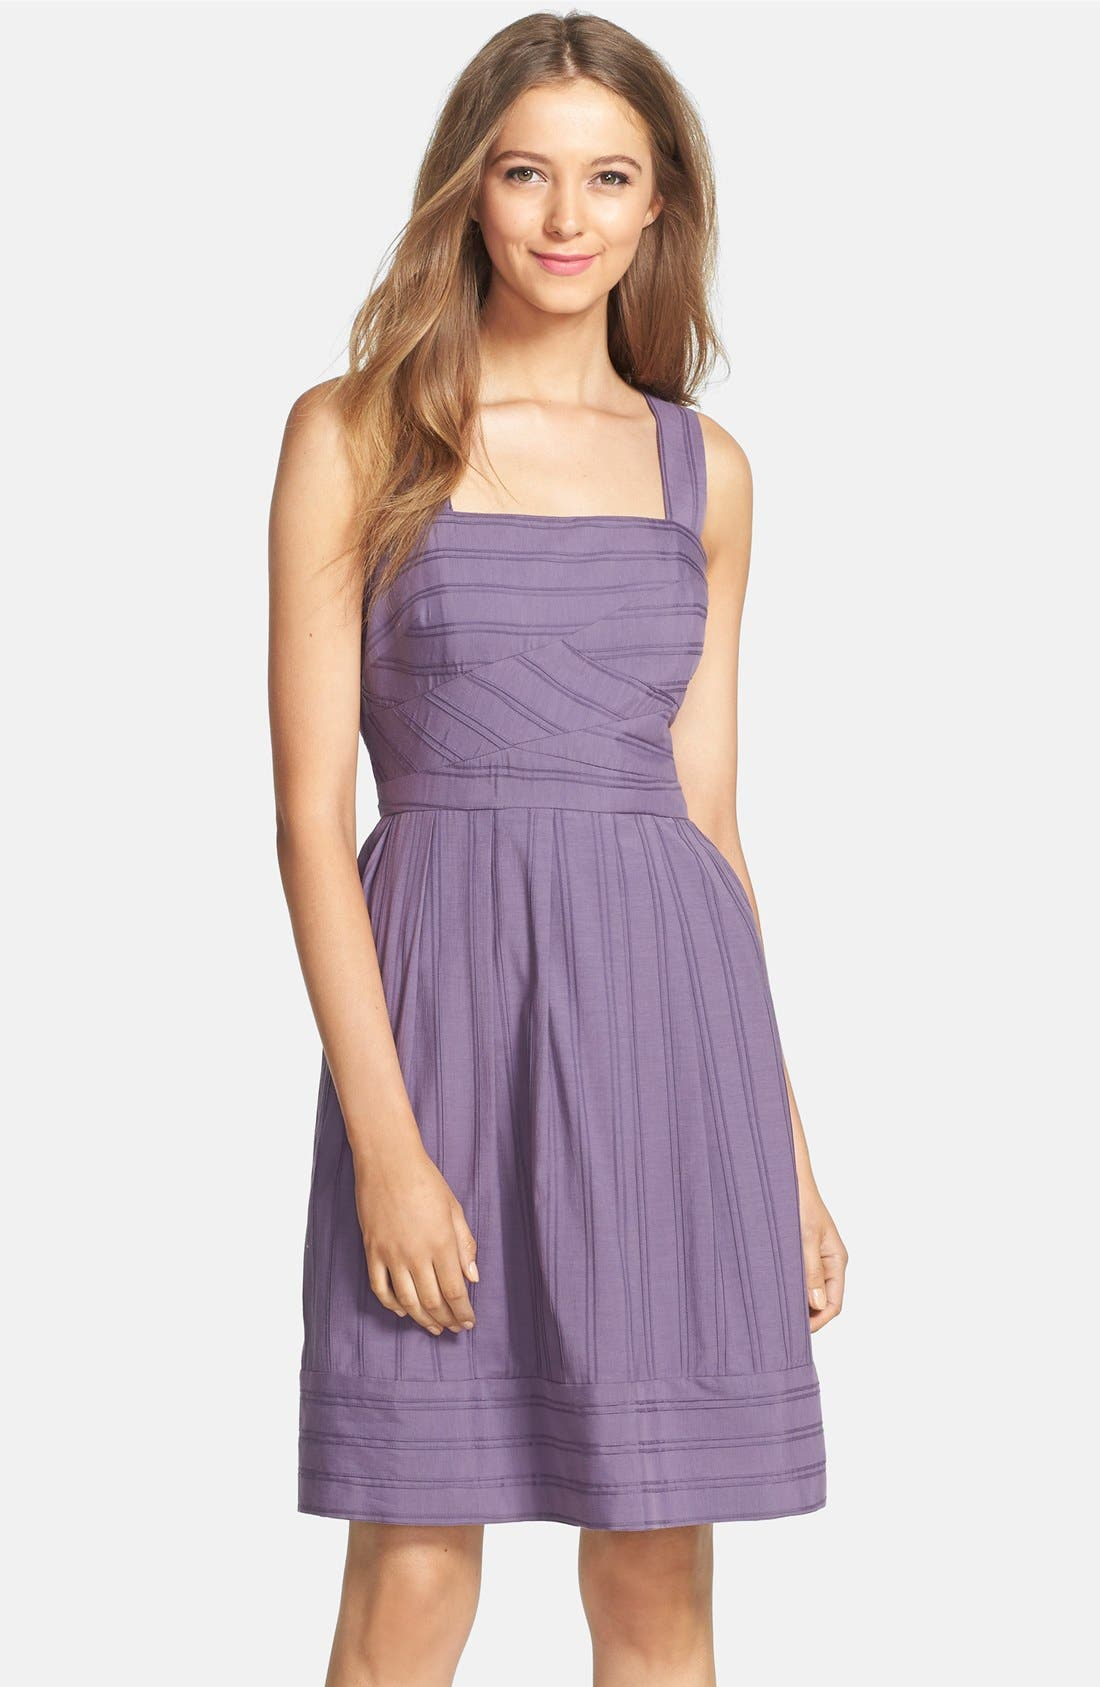 Alternate Image 1 Selected - Ivy & Blu Pintuck Fit & Flare Tank Dress